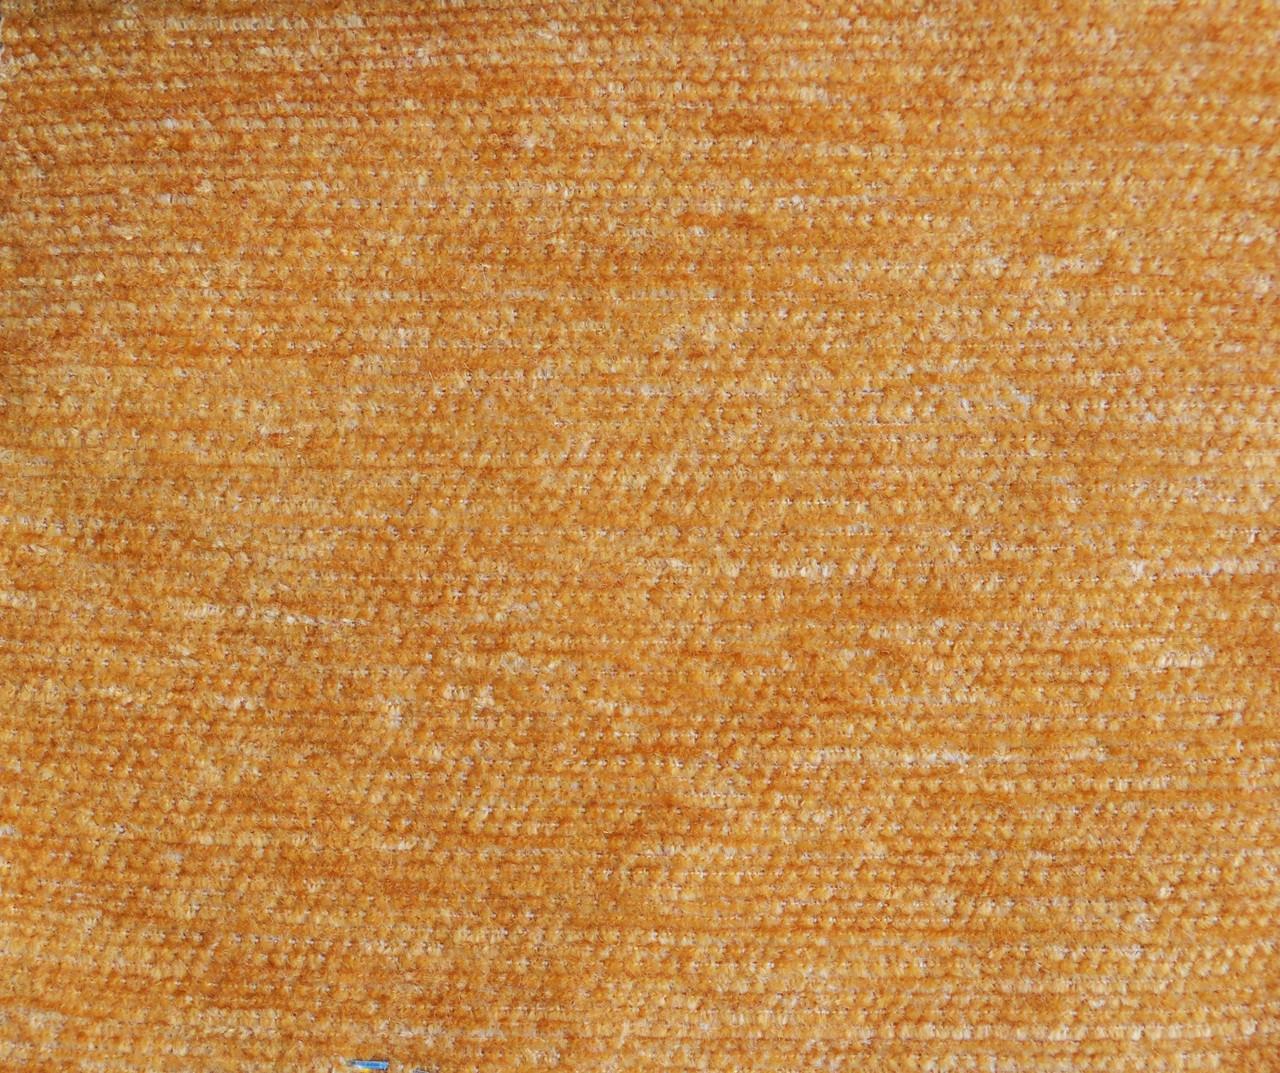 Мебельная ткань Acril 60% Бянколини 13